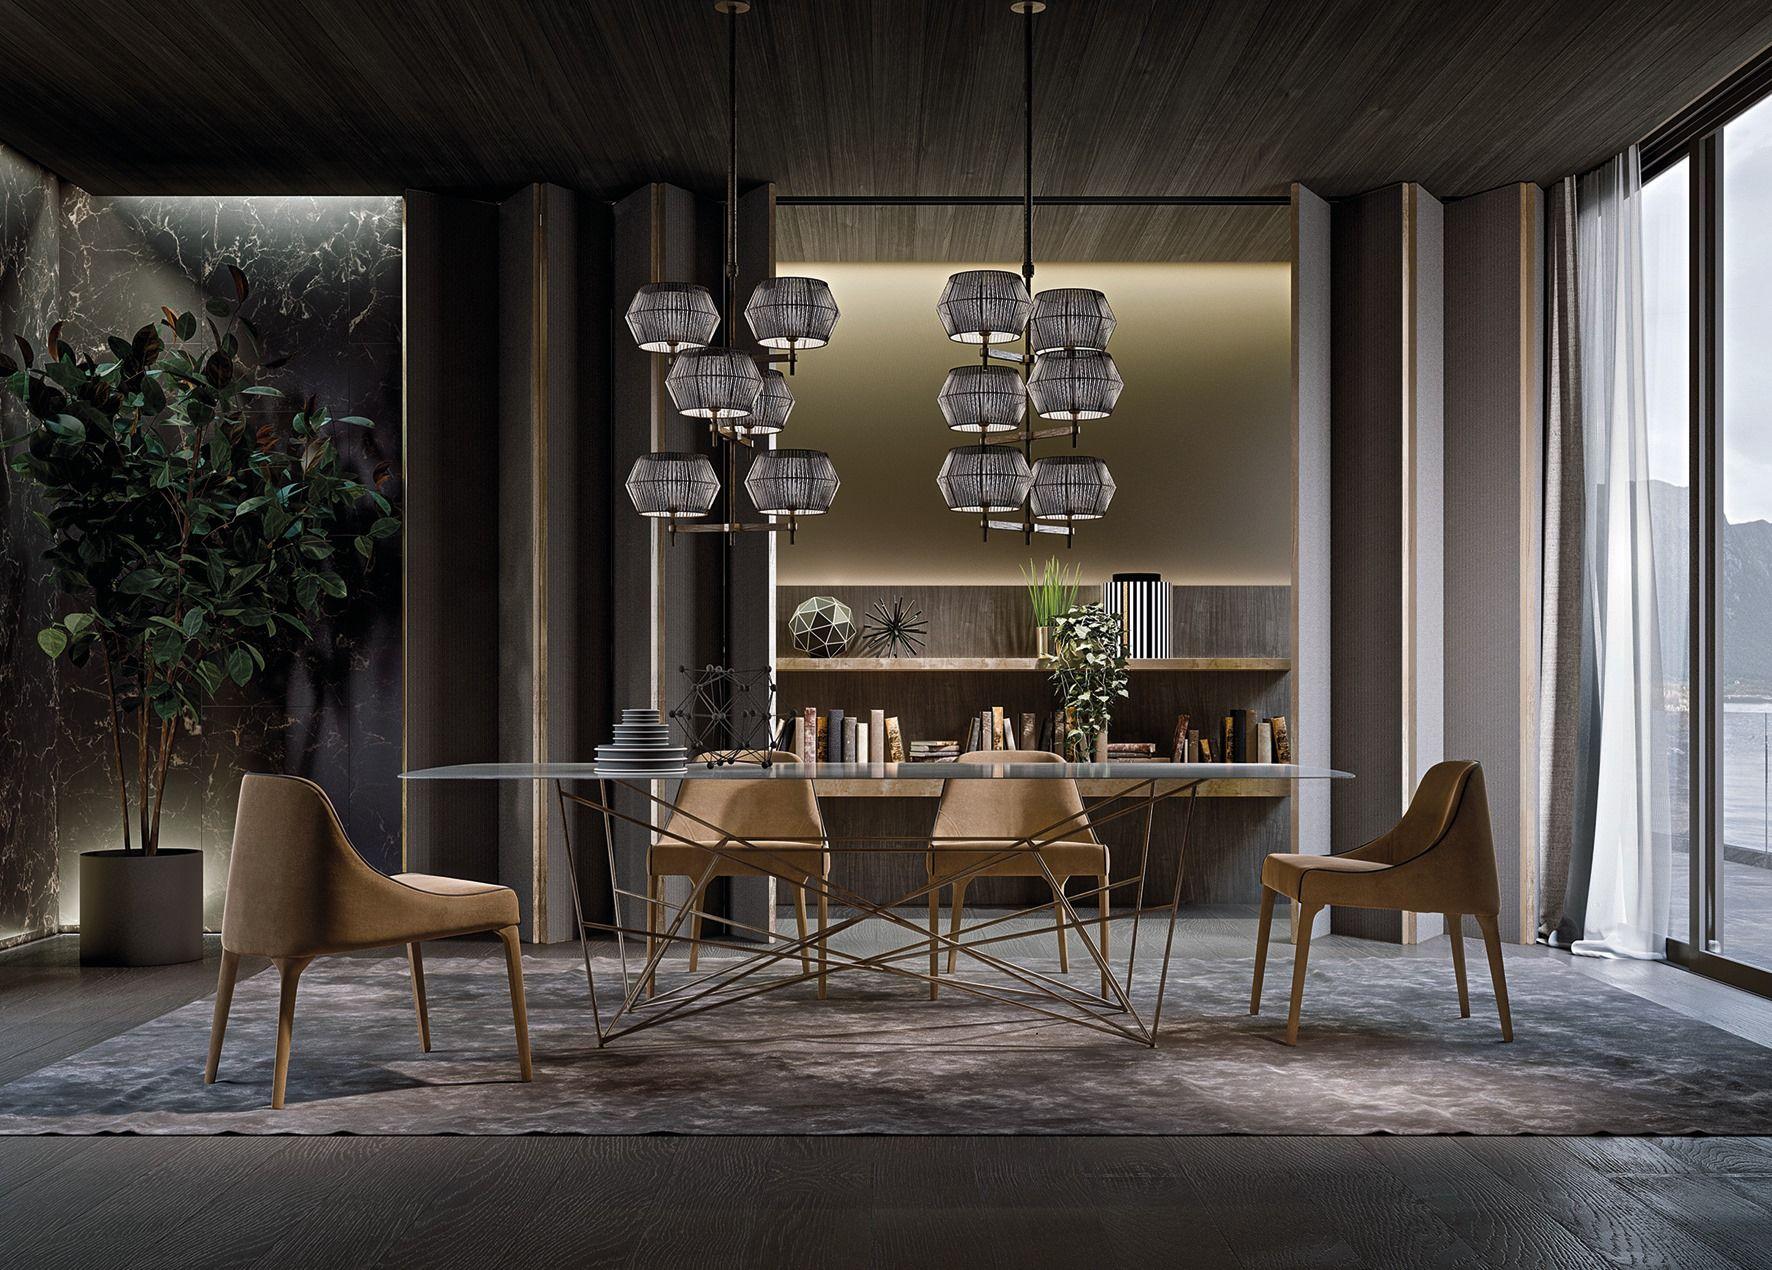 Frigerio Jackie Chair Frigeriosalotti Luxuryi Contemporary Designers Furniture Luxury Furniture Brands Table Furniture Design